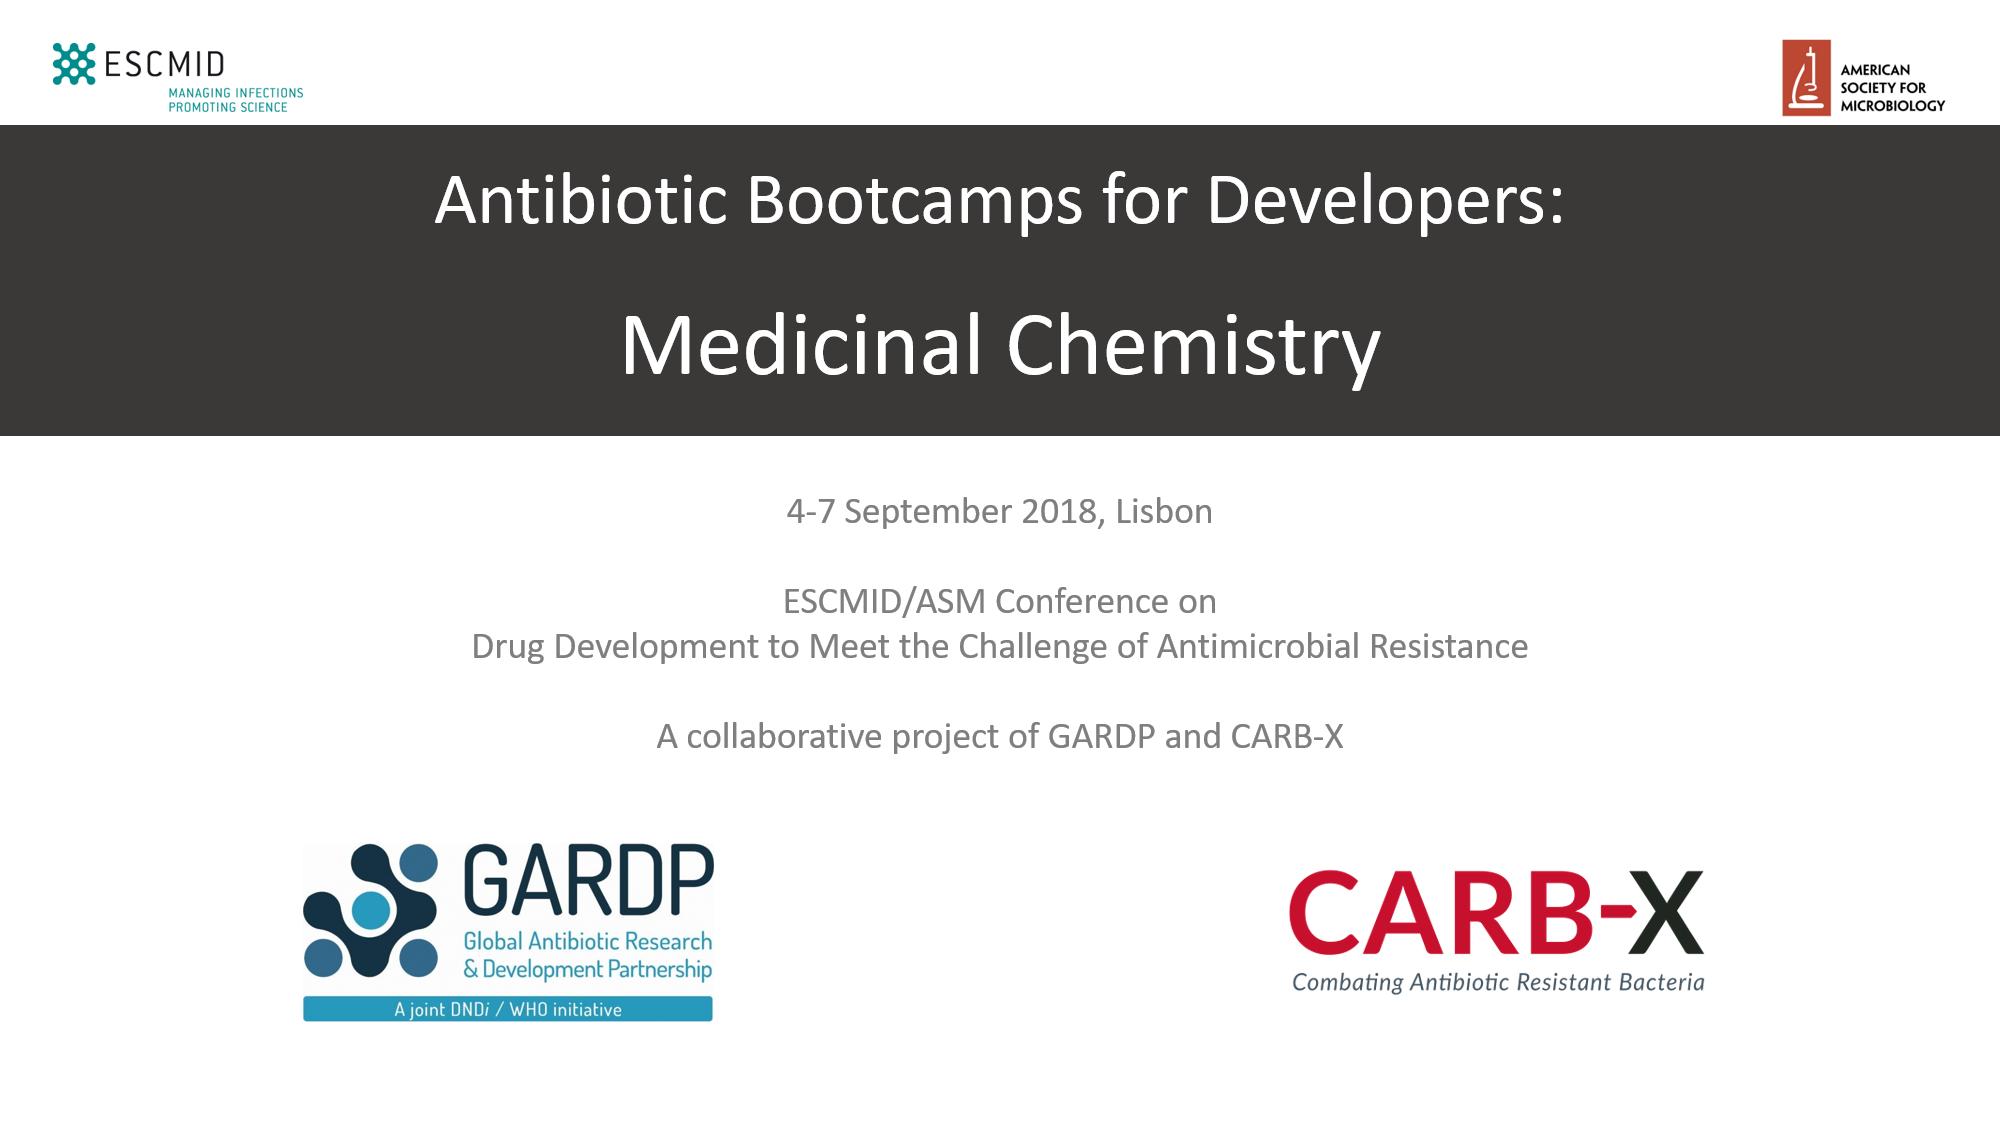 Bootcamp: Medicinal Chemistry (ESCMID/ASM 2018)